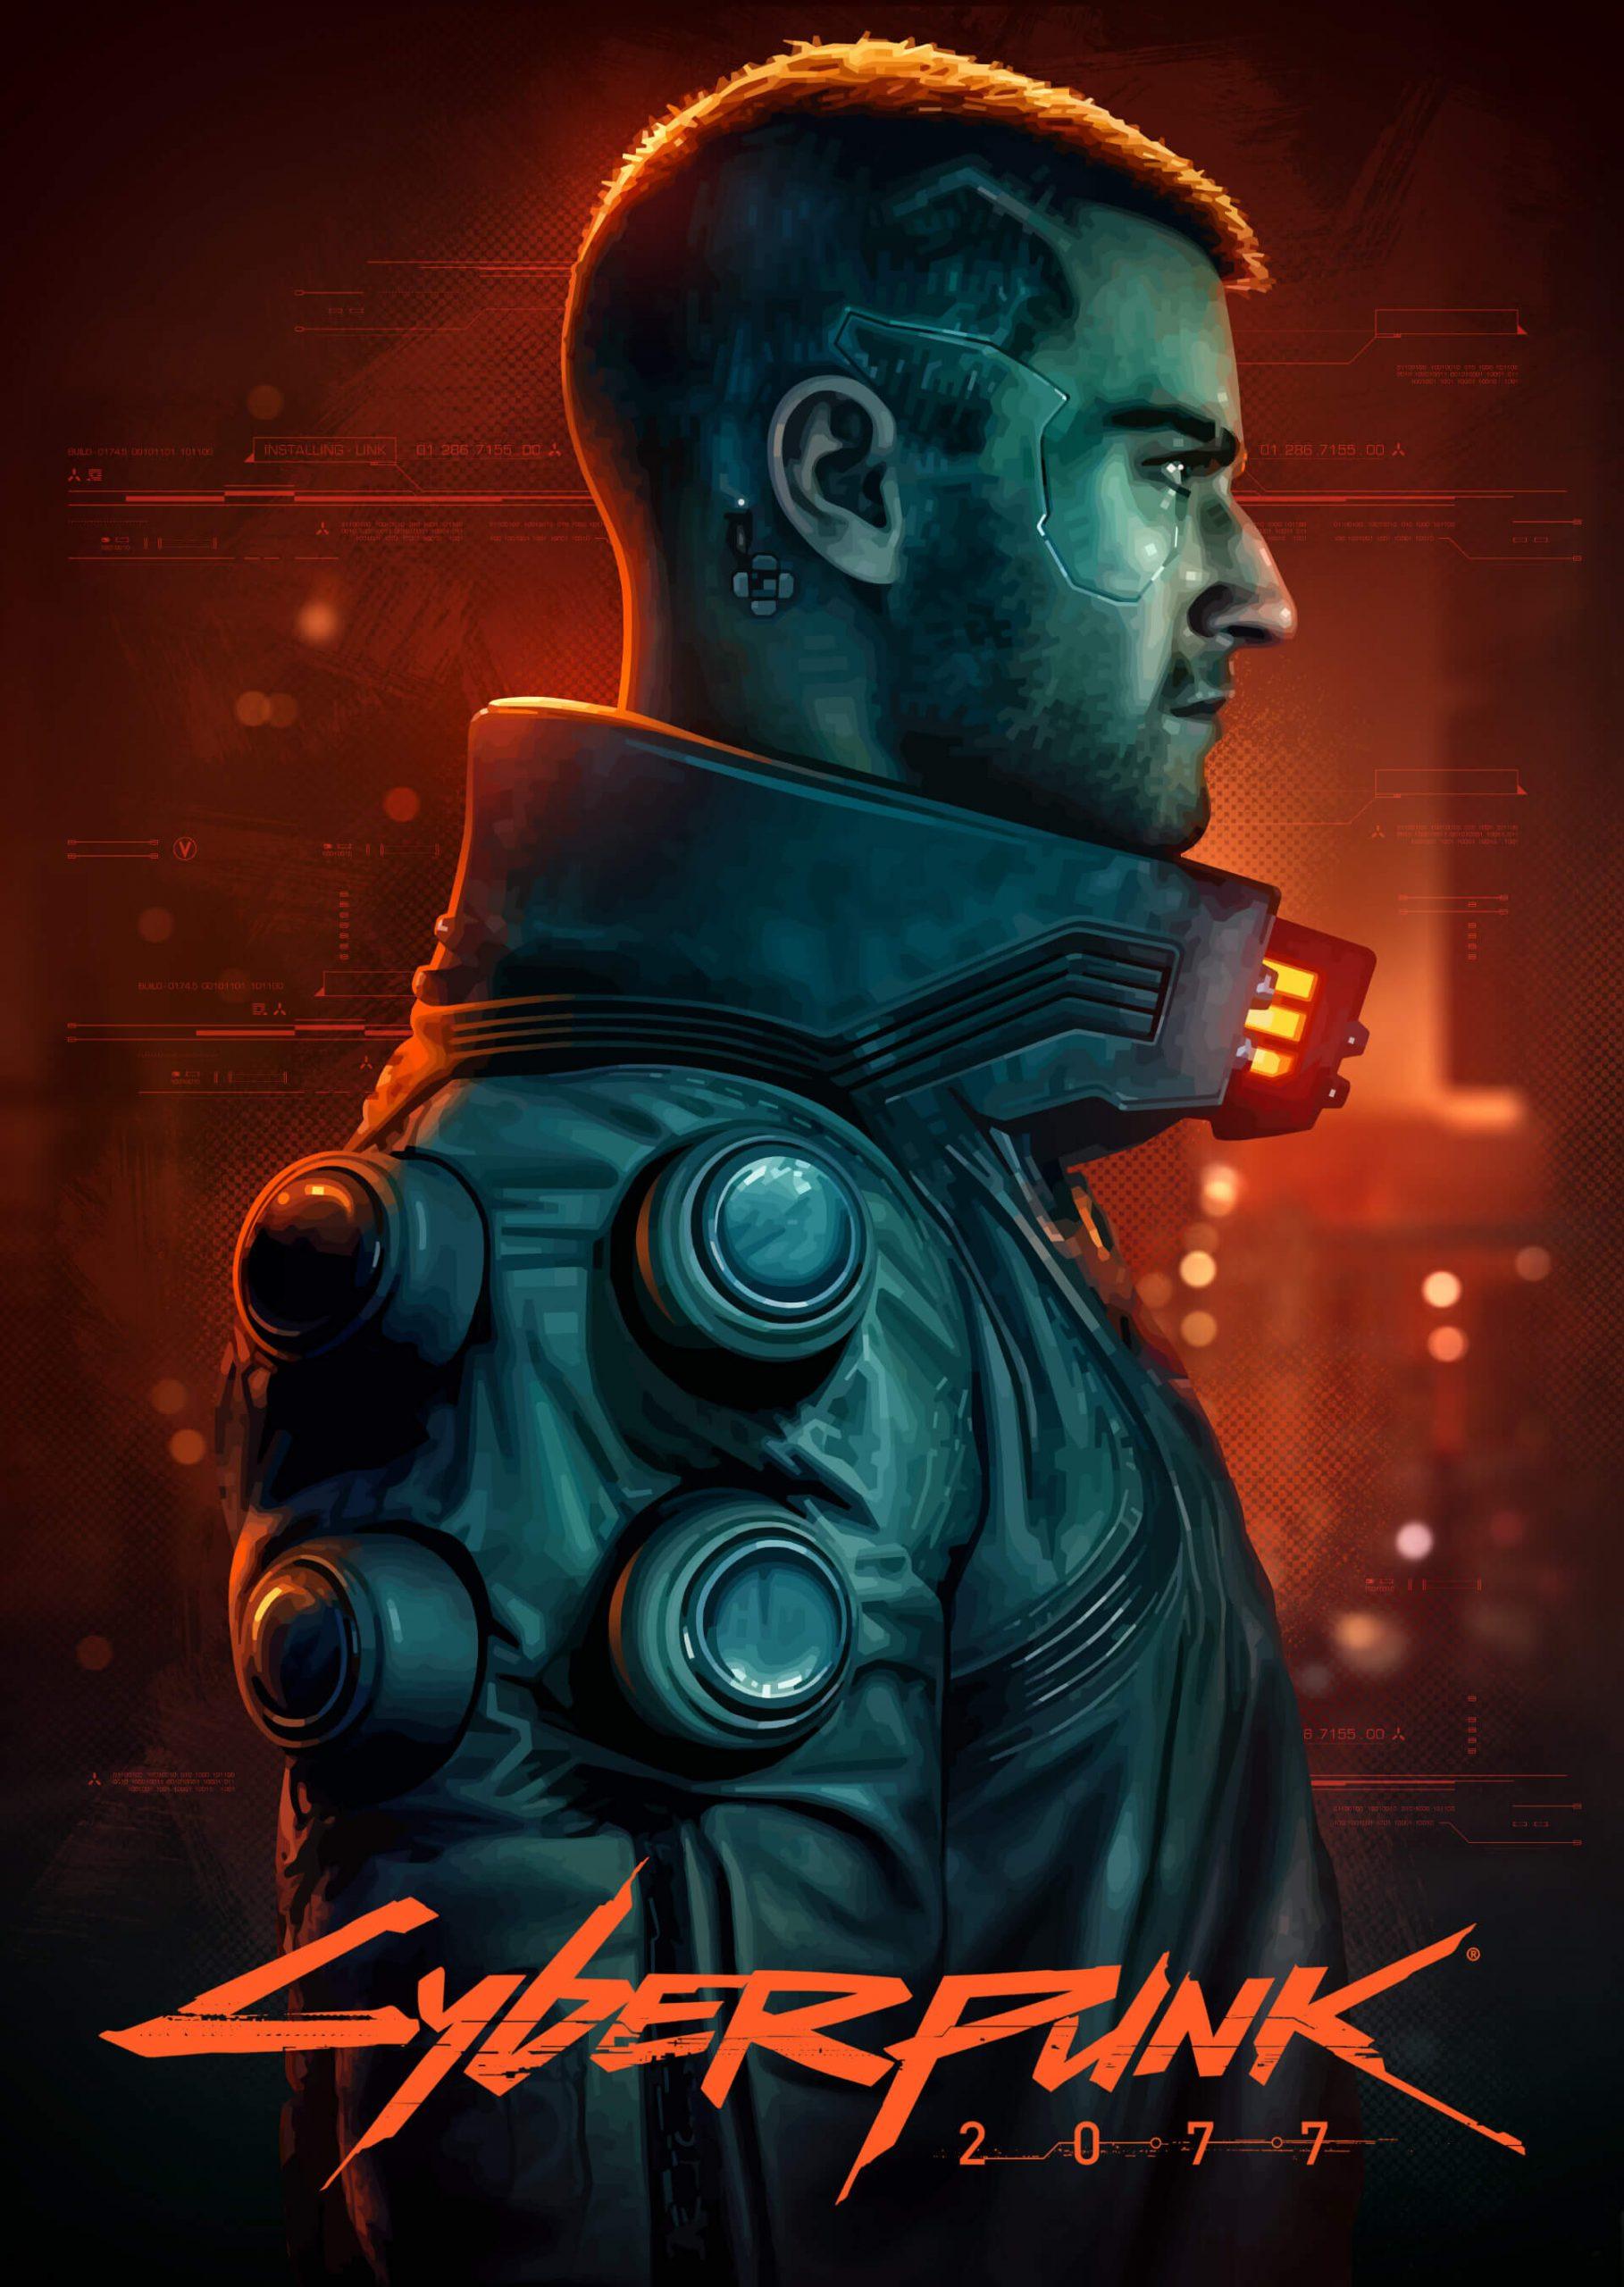 Brian Taylor – Cyberpunk 2077 Poster